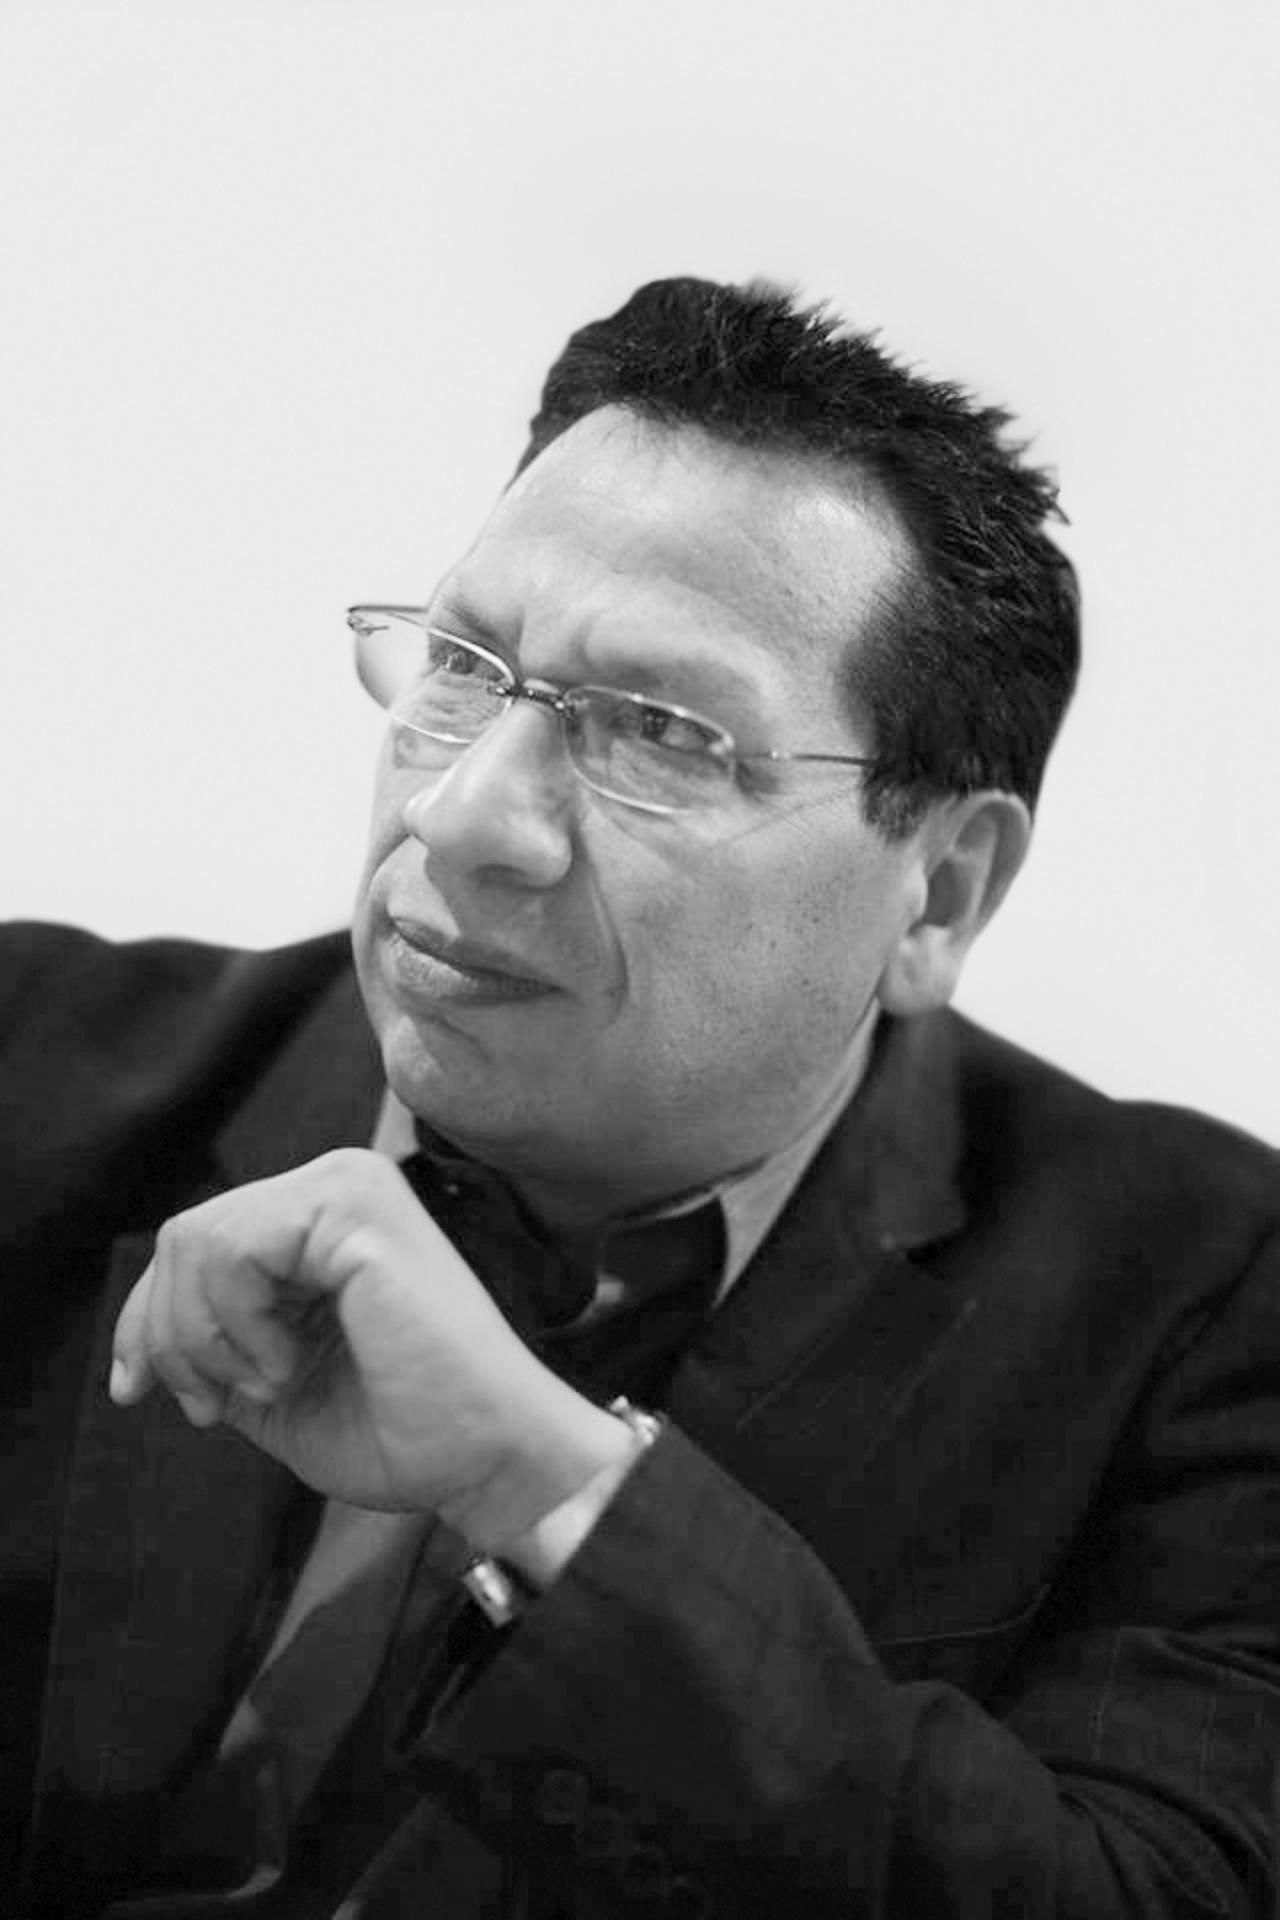 En Durango, el PRI le arrebató espacios al PAN, no a Morena